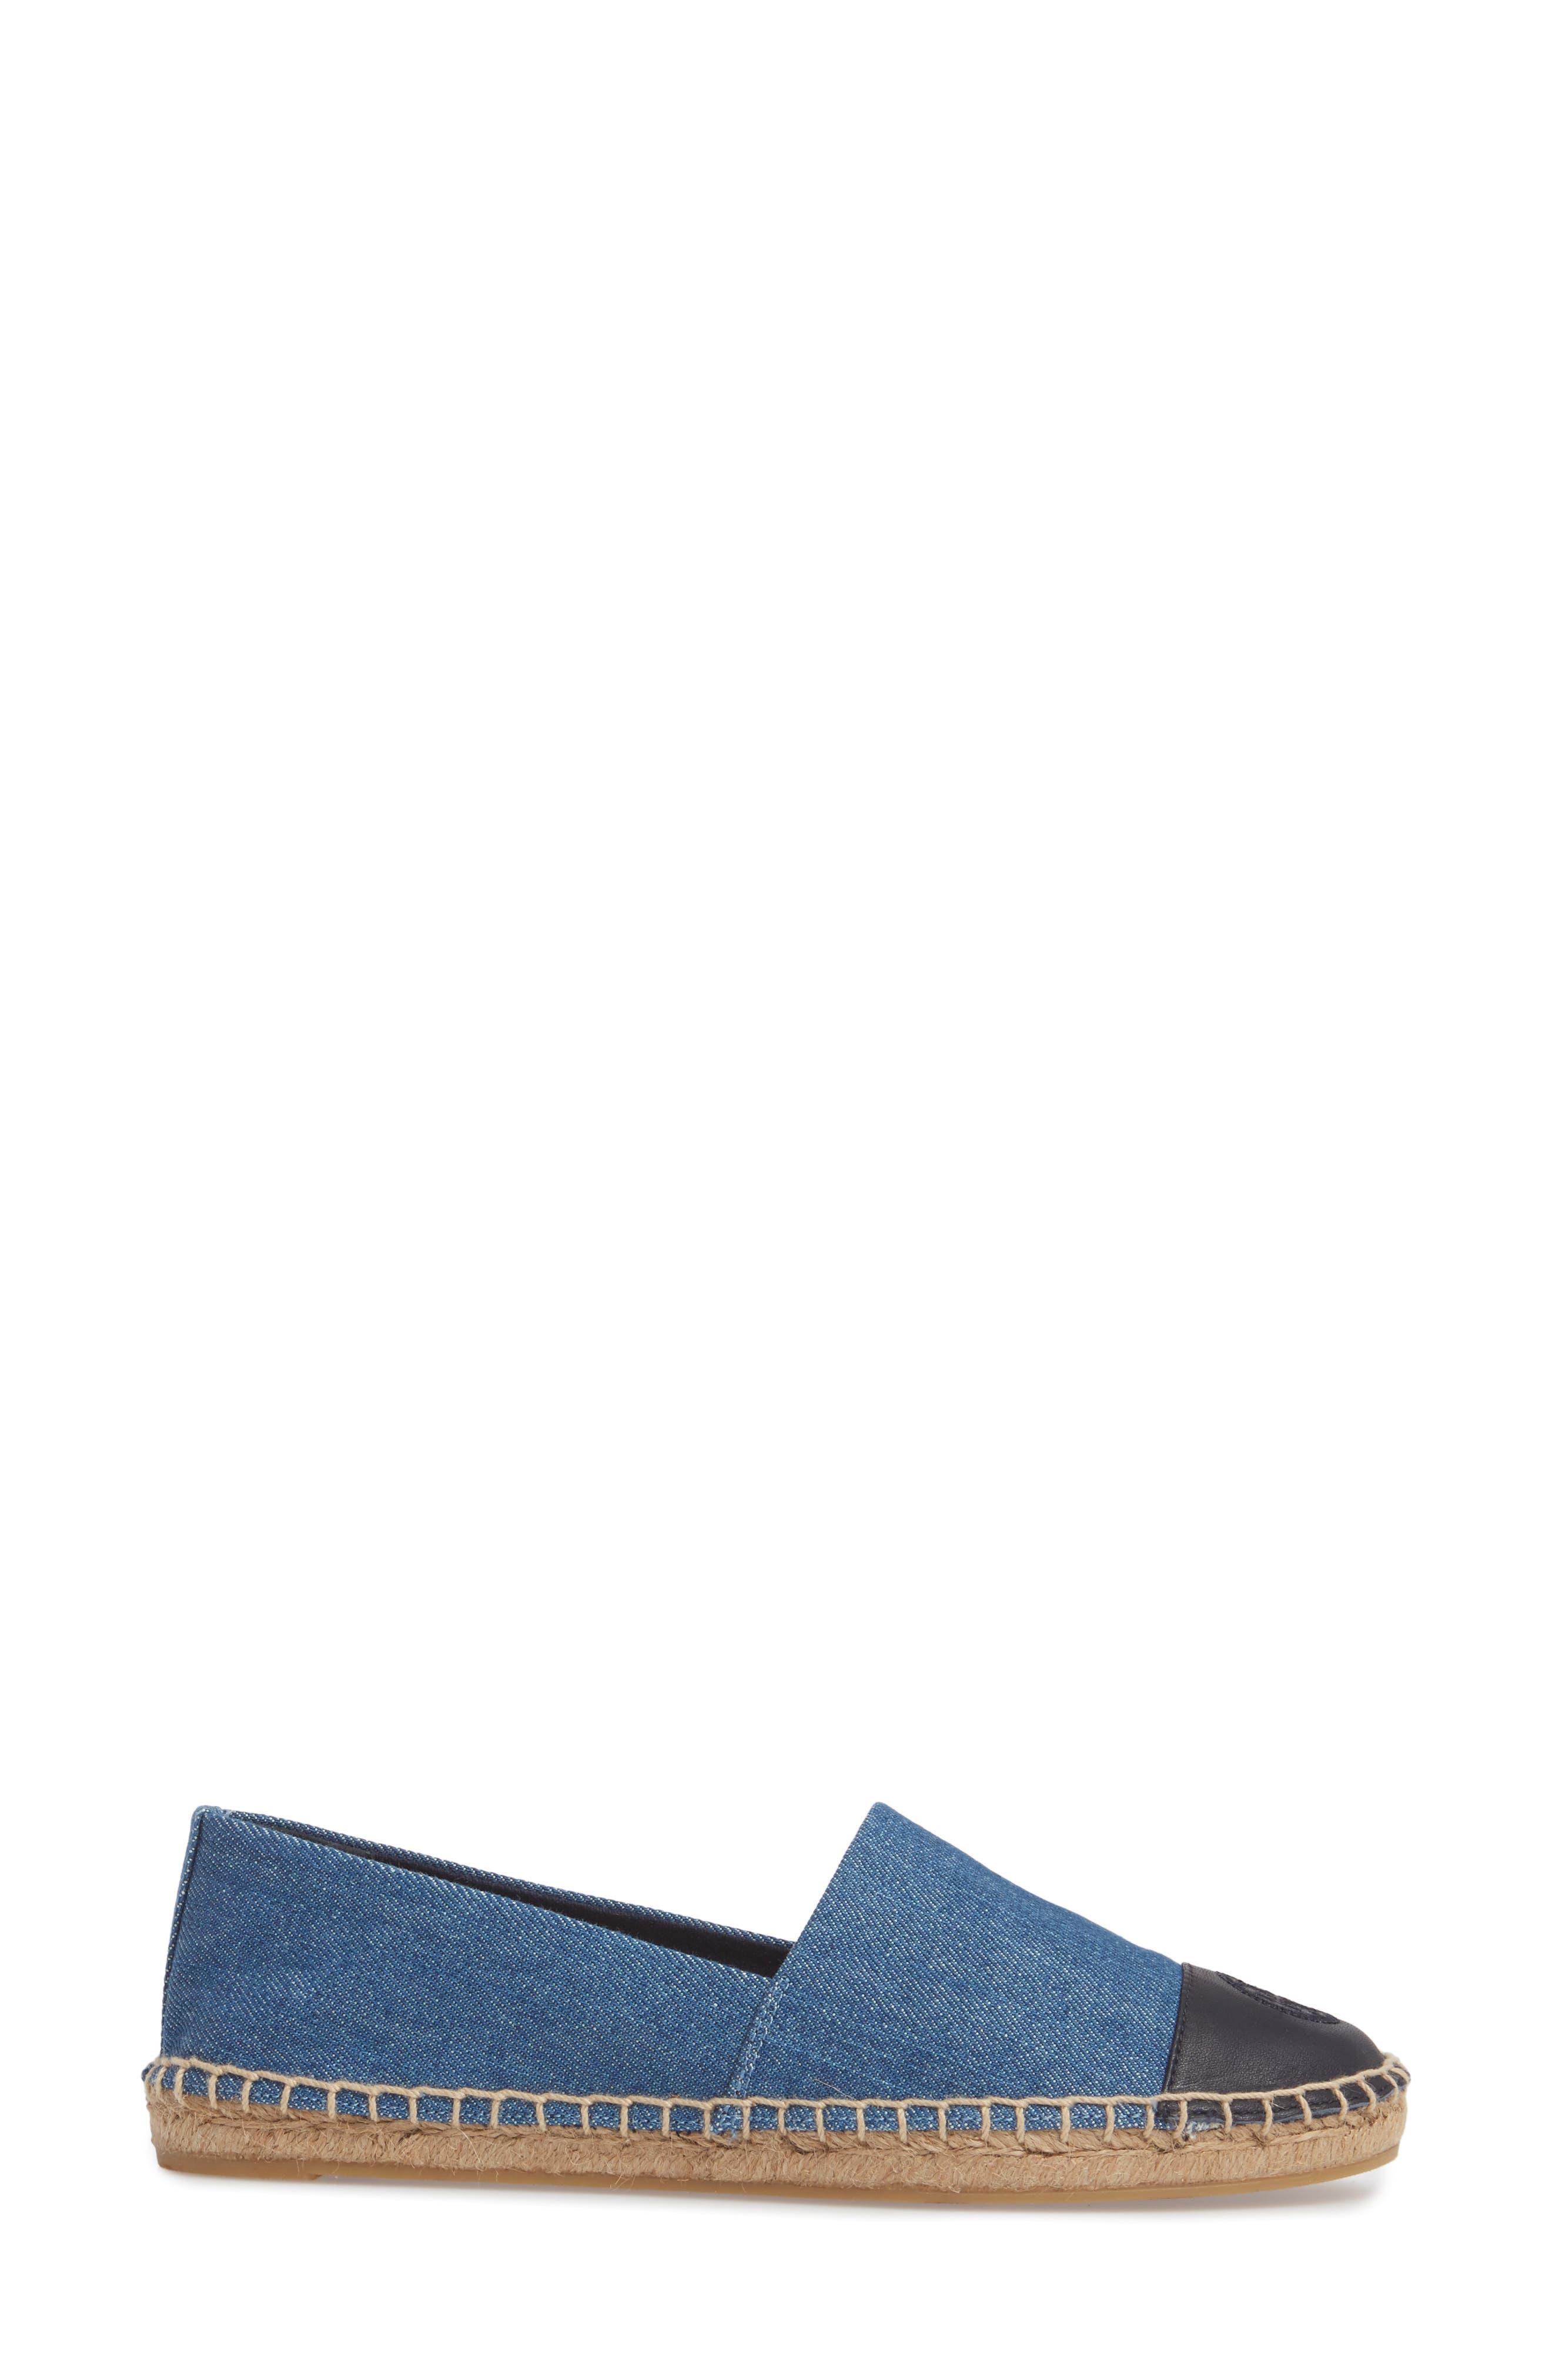 Colorblock Espadrille Flat,                             Alternate thumbnail 3, color,                             DENIM CHAMBRAY/ NAVY